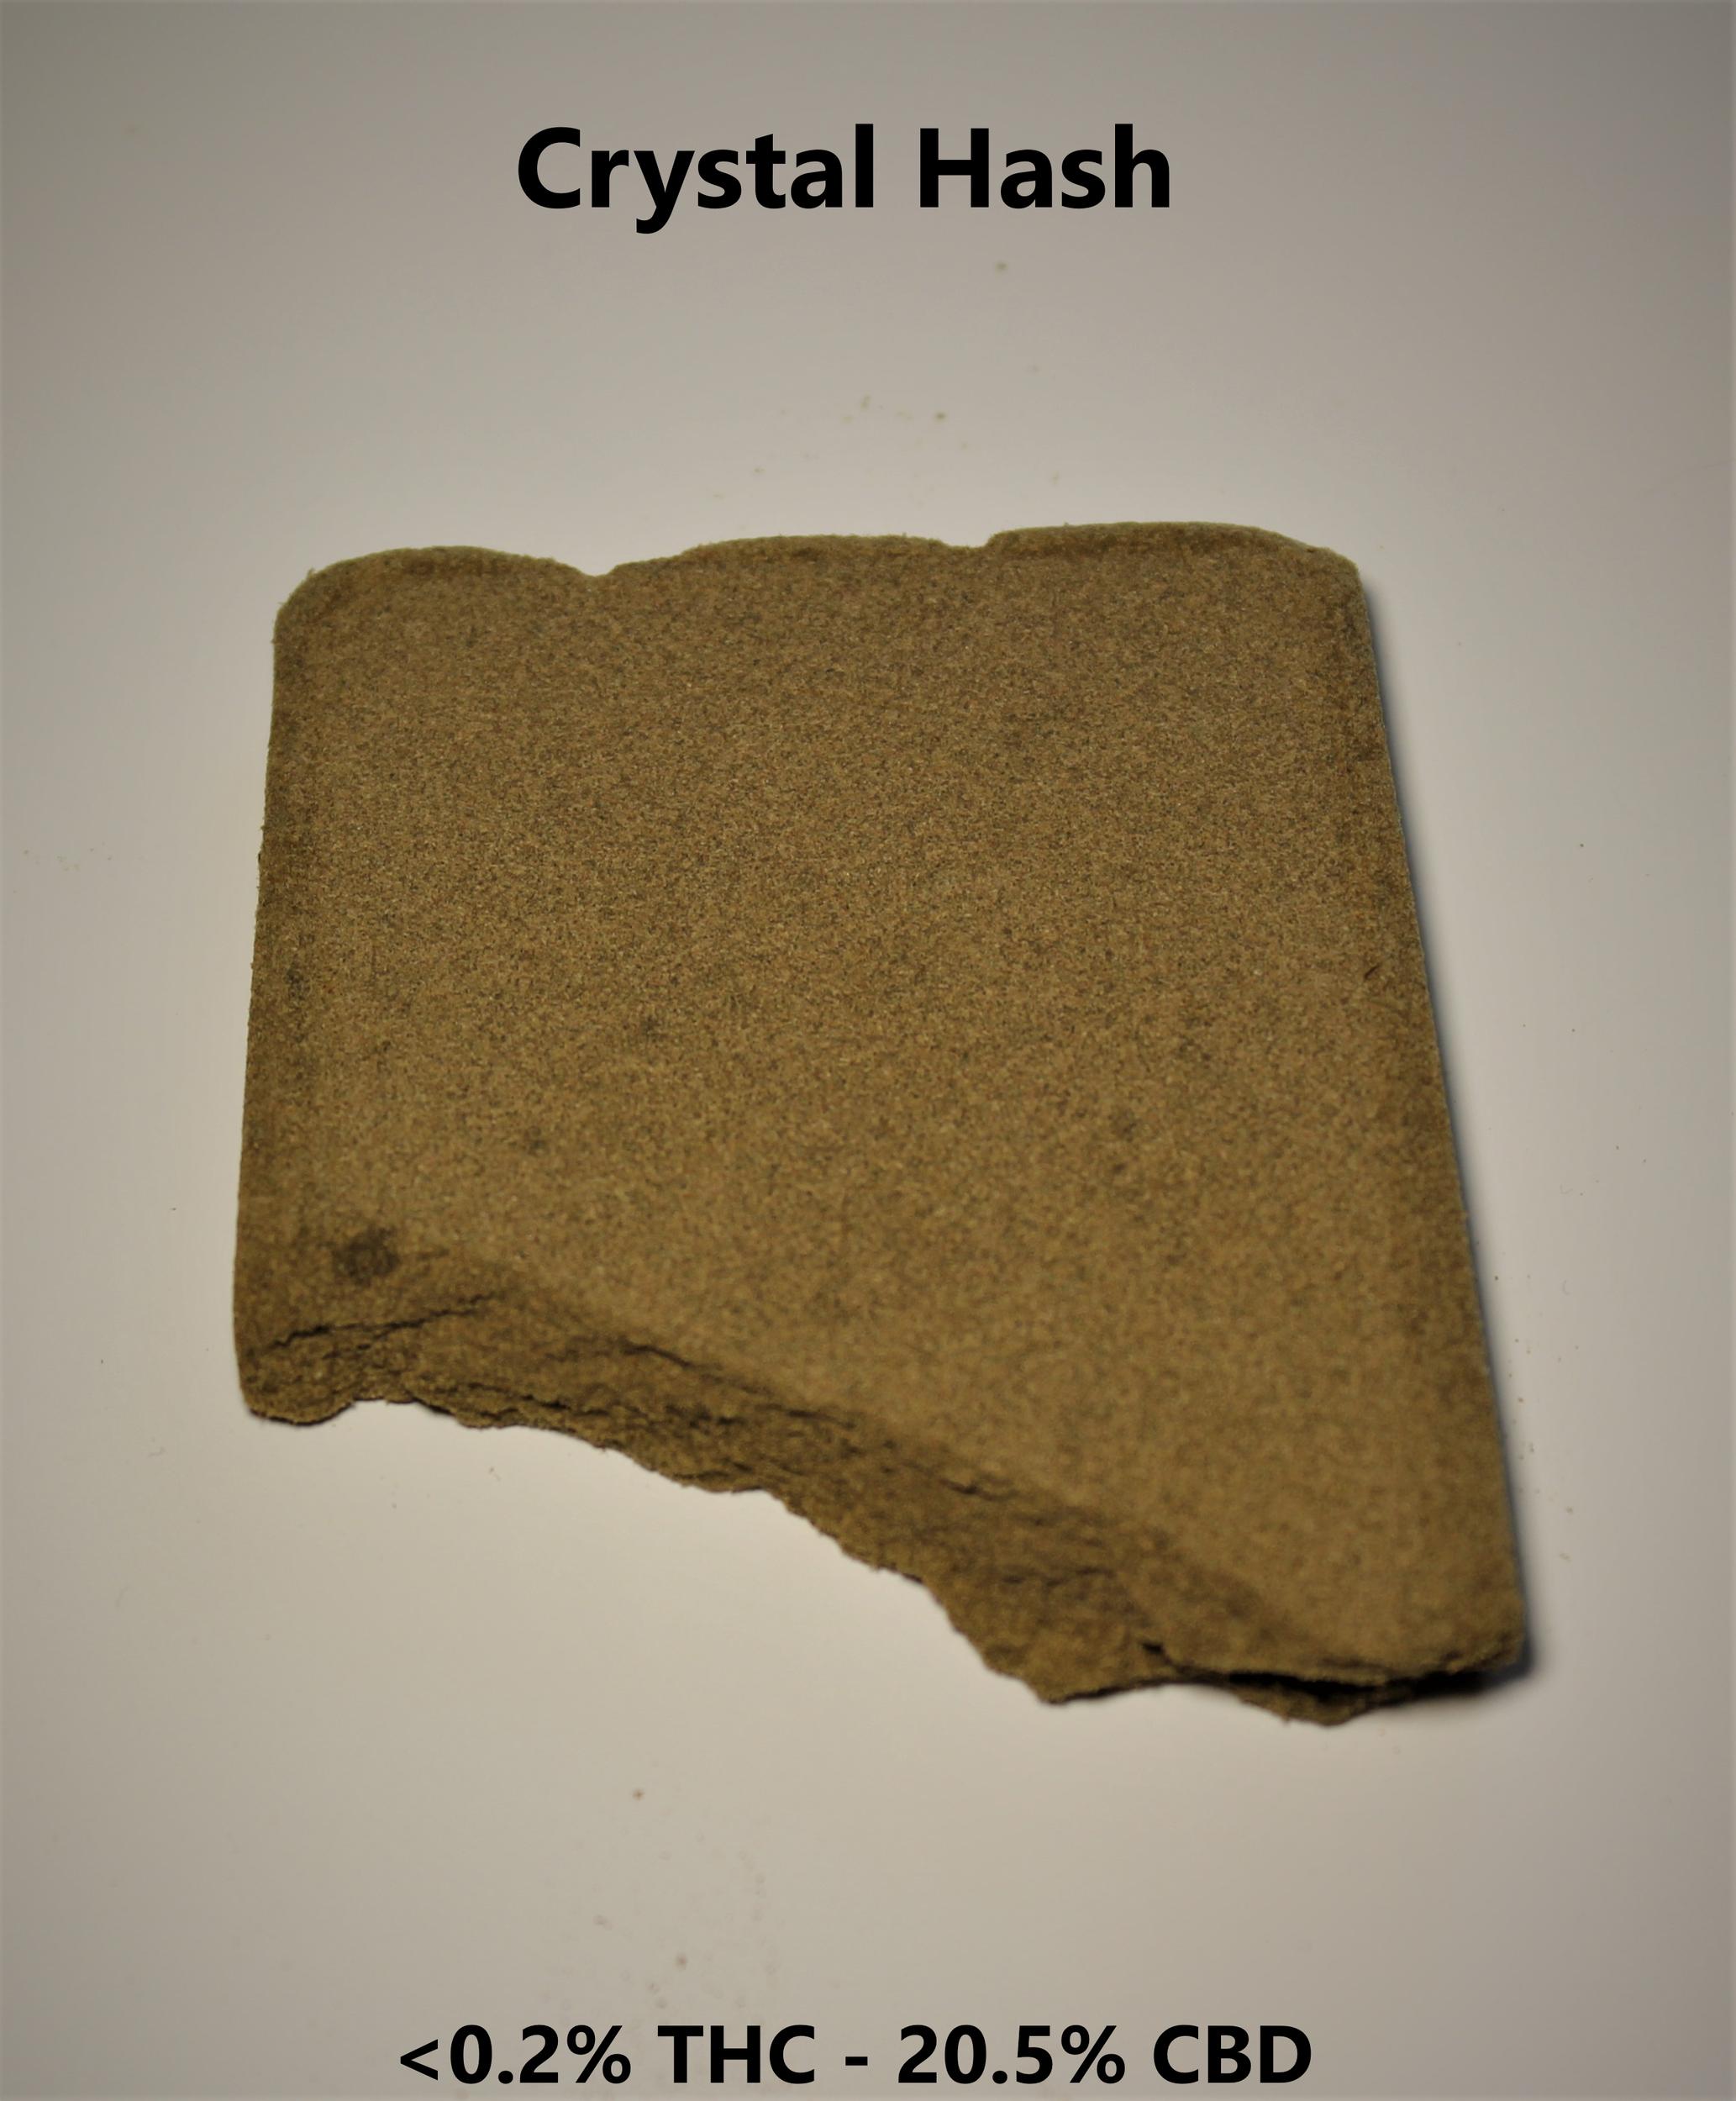 Crystal Pollen/Hash - 0.185% THC / 20.5% CBD